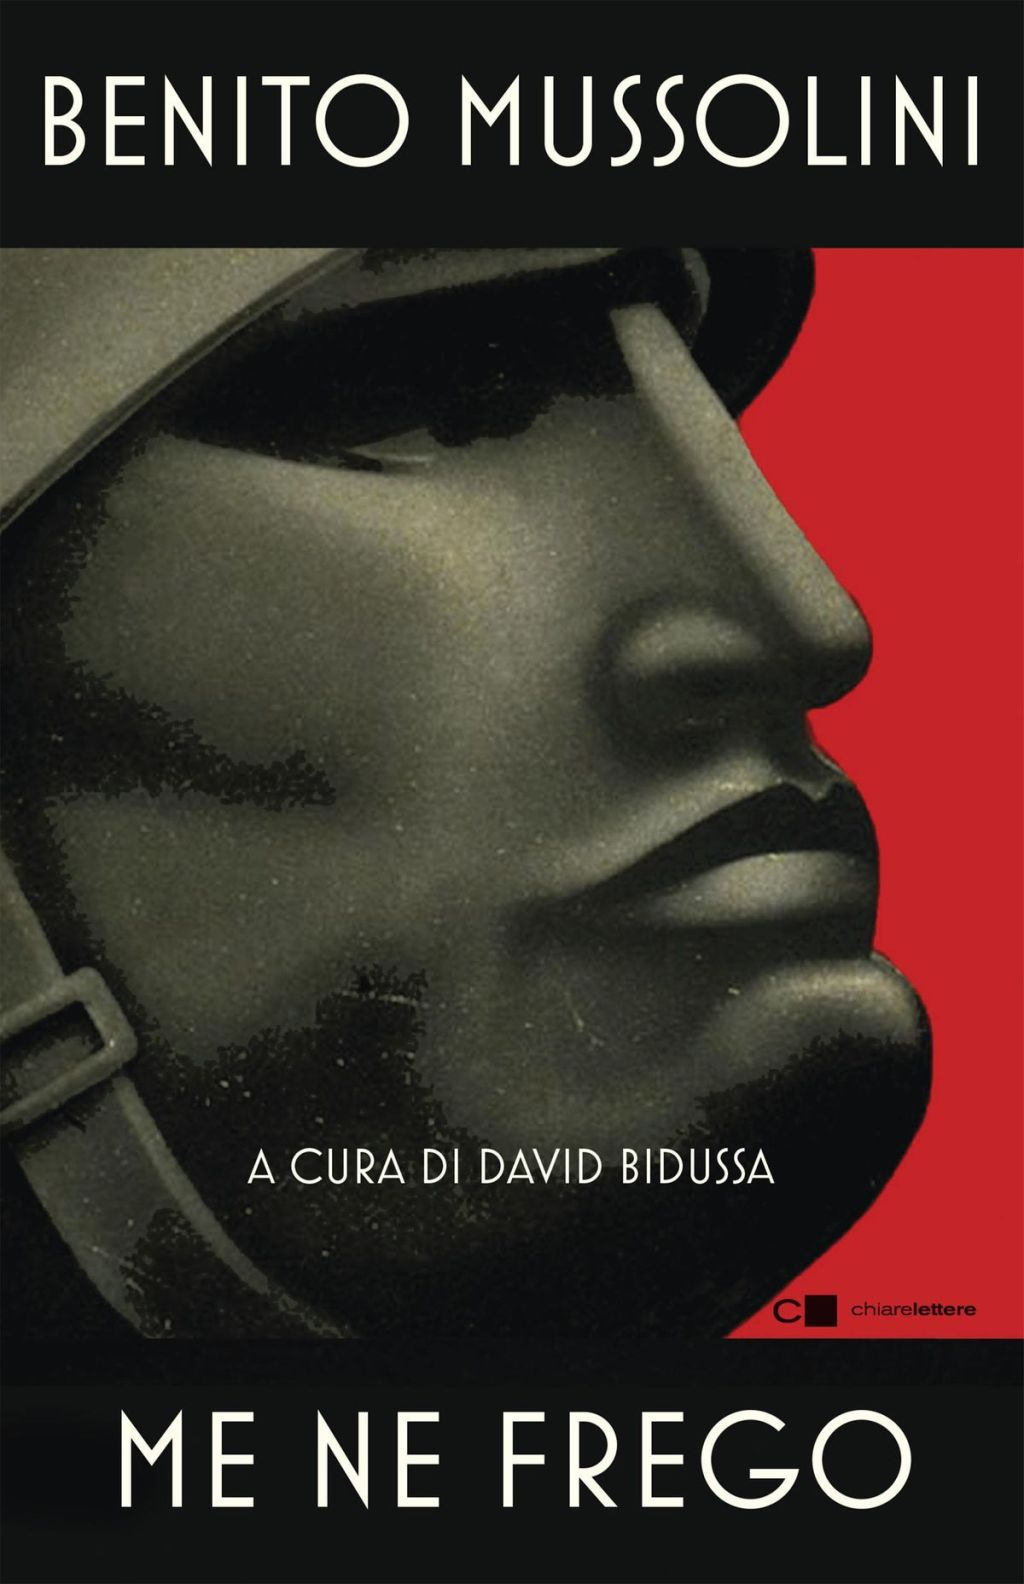 David Bidussa